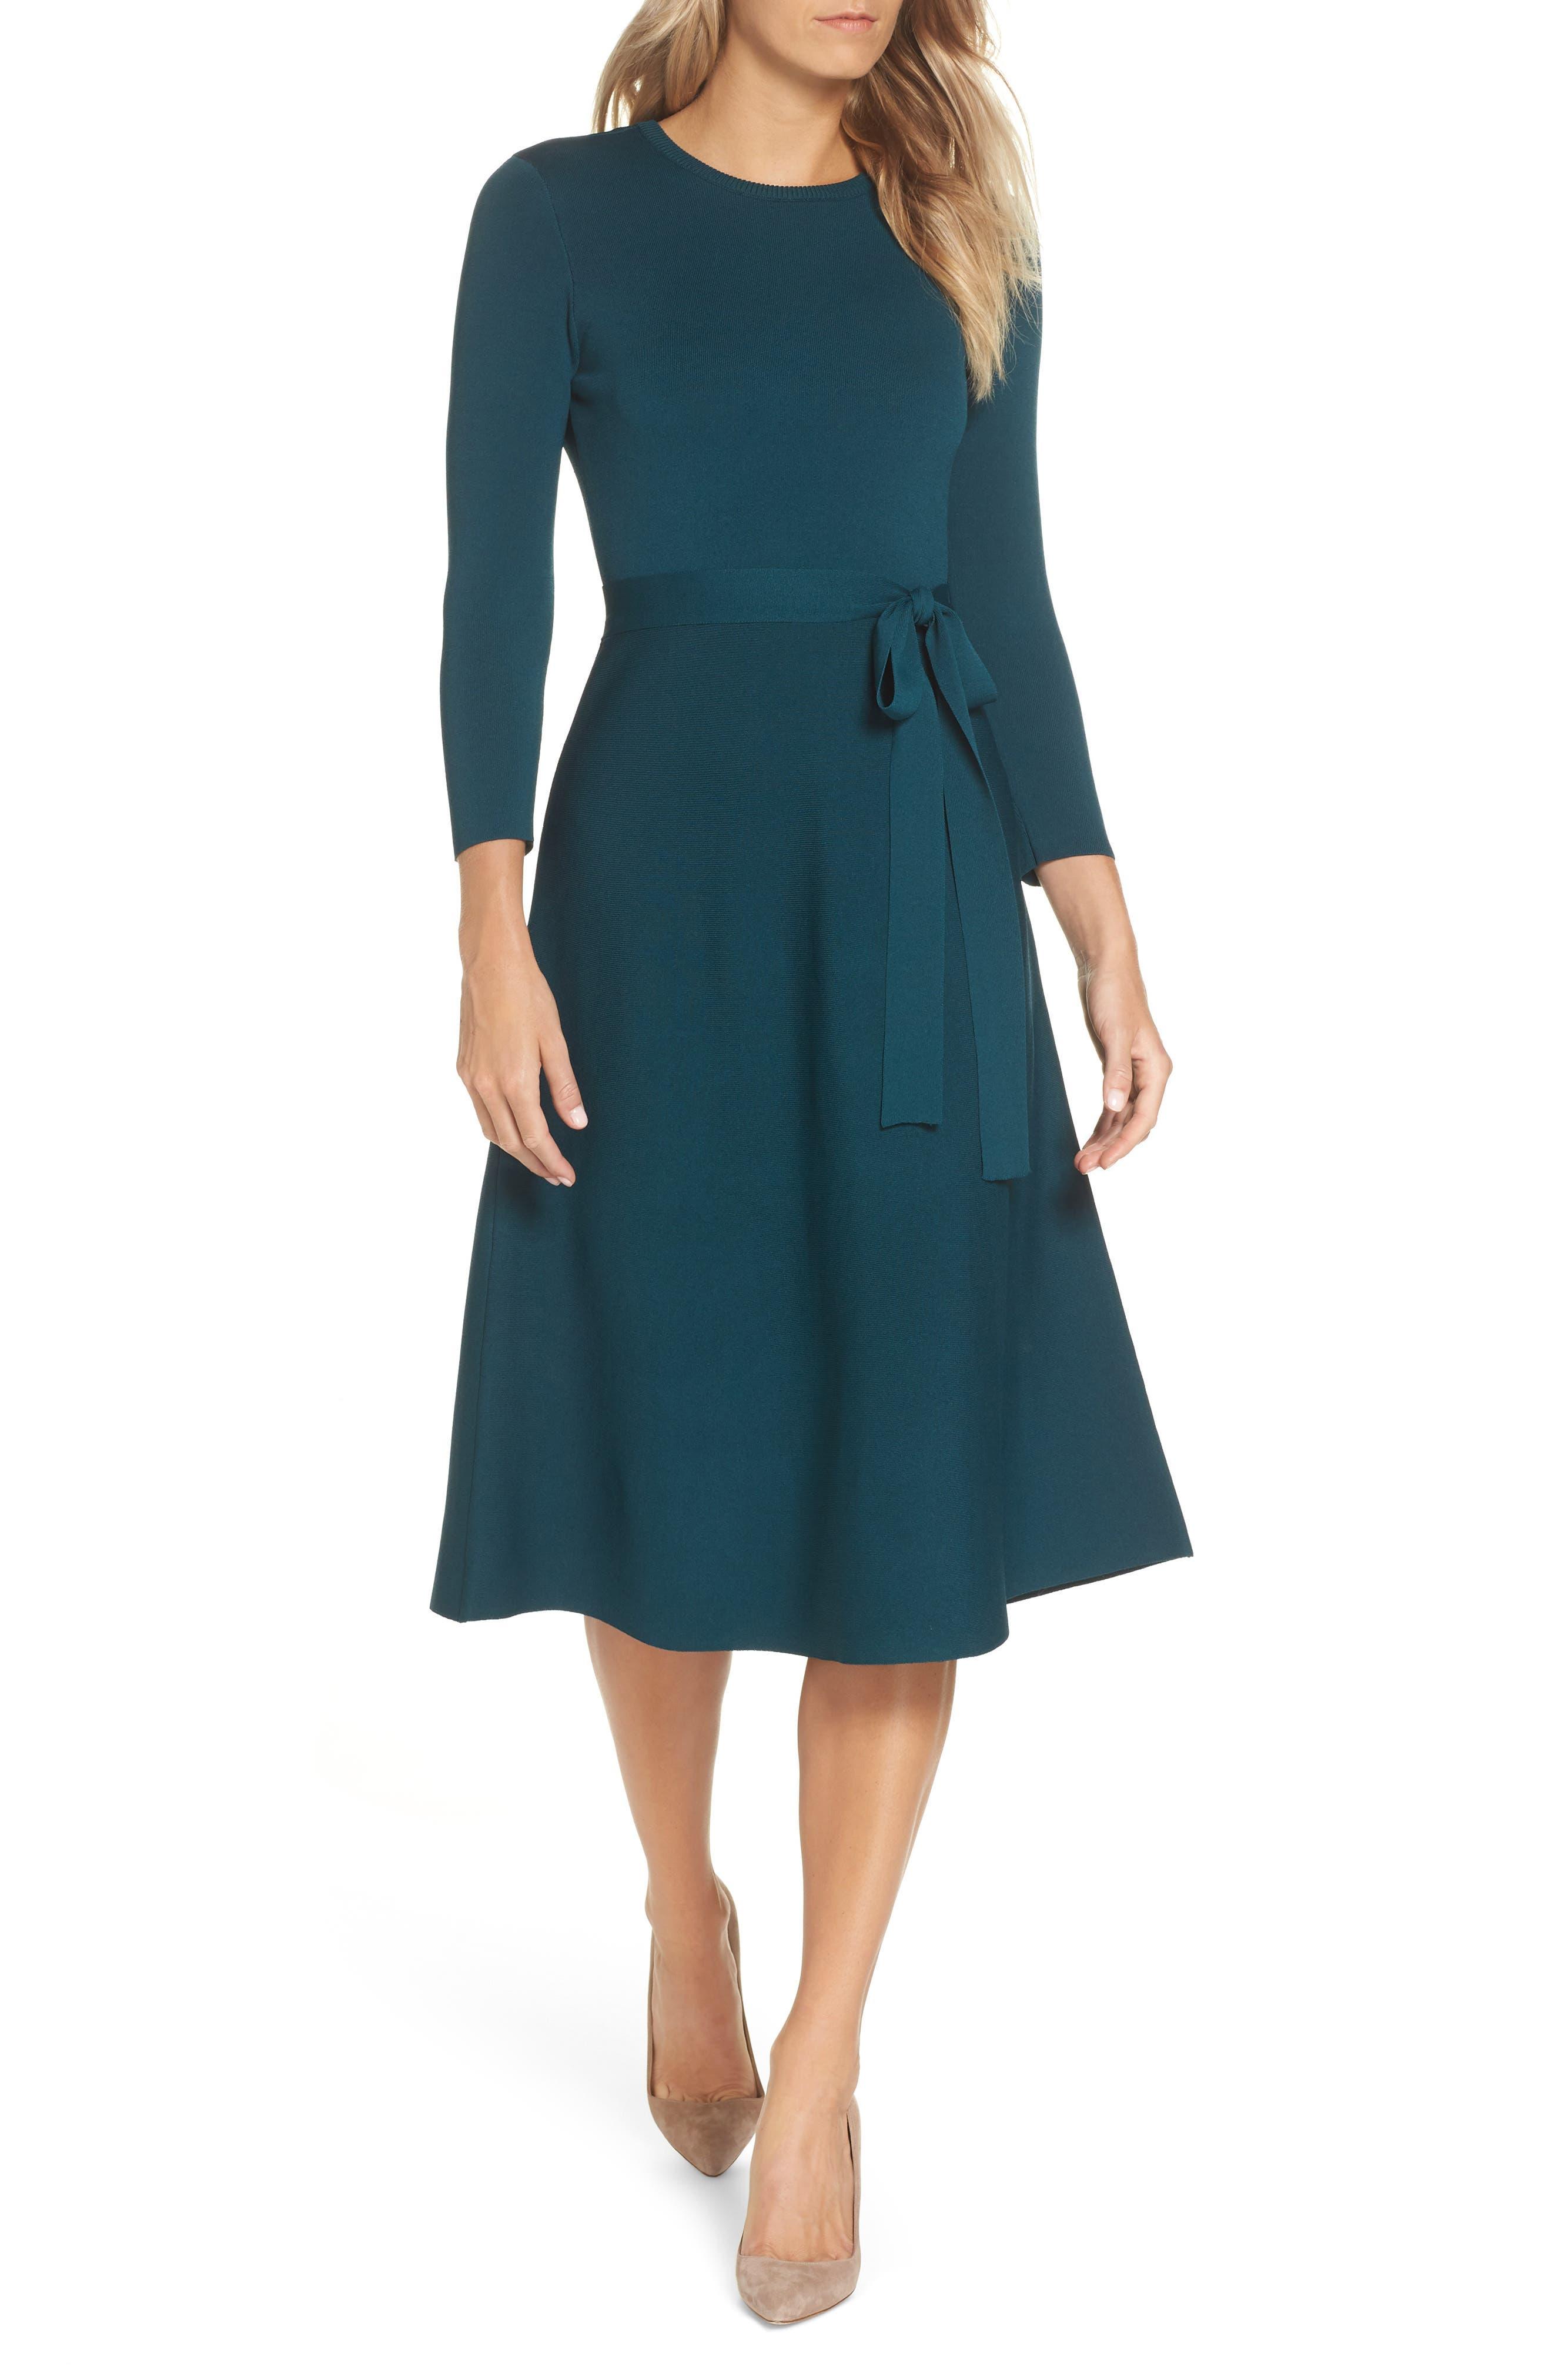 Womens Dress Dark Blue Beige Print Flared Short Sleeves Free Size 1X 2X